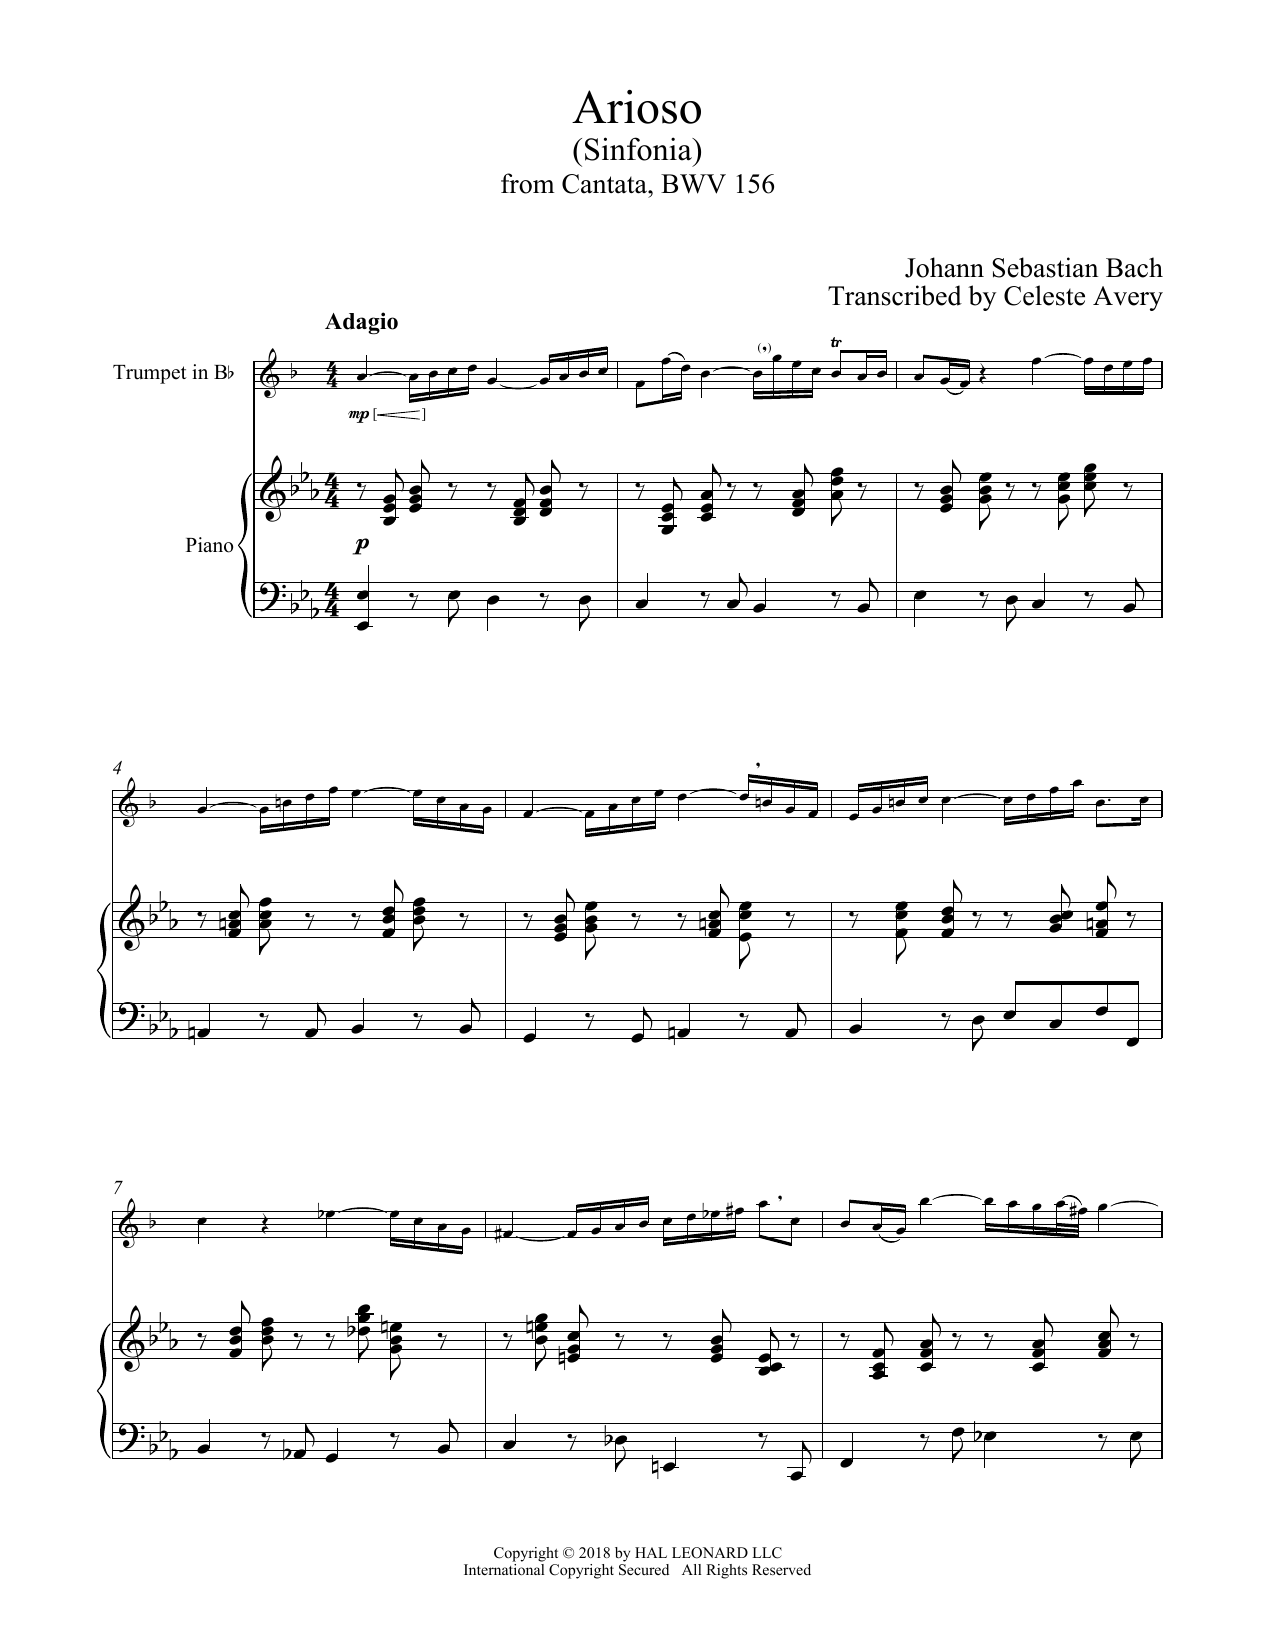 Johann Sebastian Bach 'Arioso' Sheet Music Notes, Chords | Download  Printable Trumpet and Piano - SKU: 409269